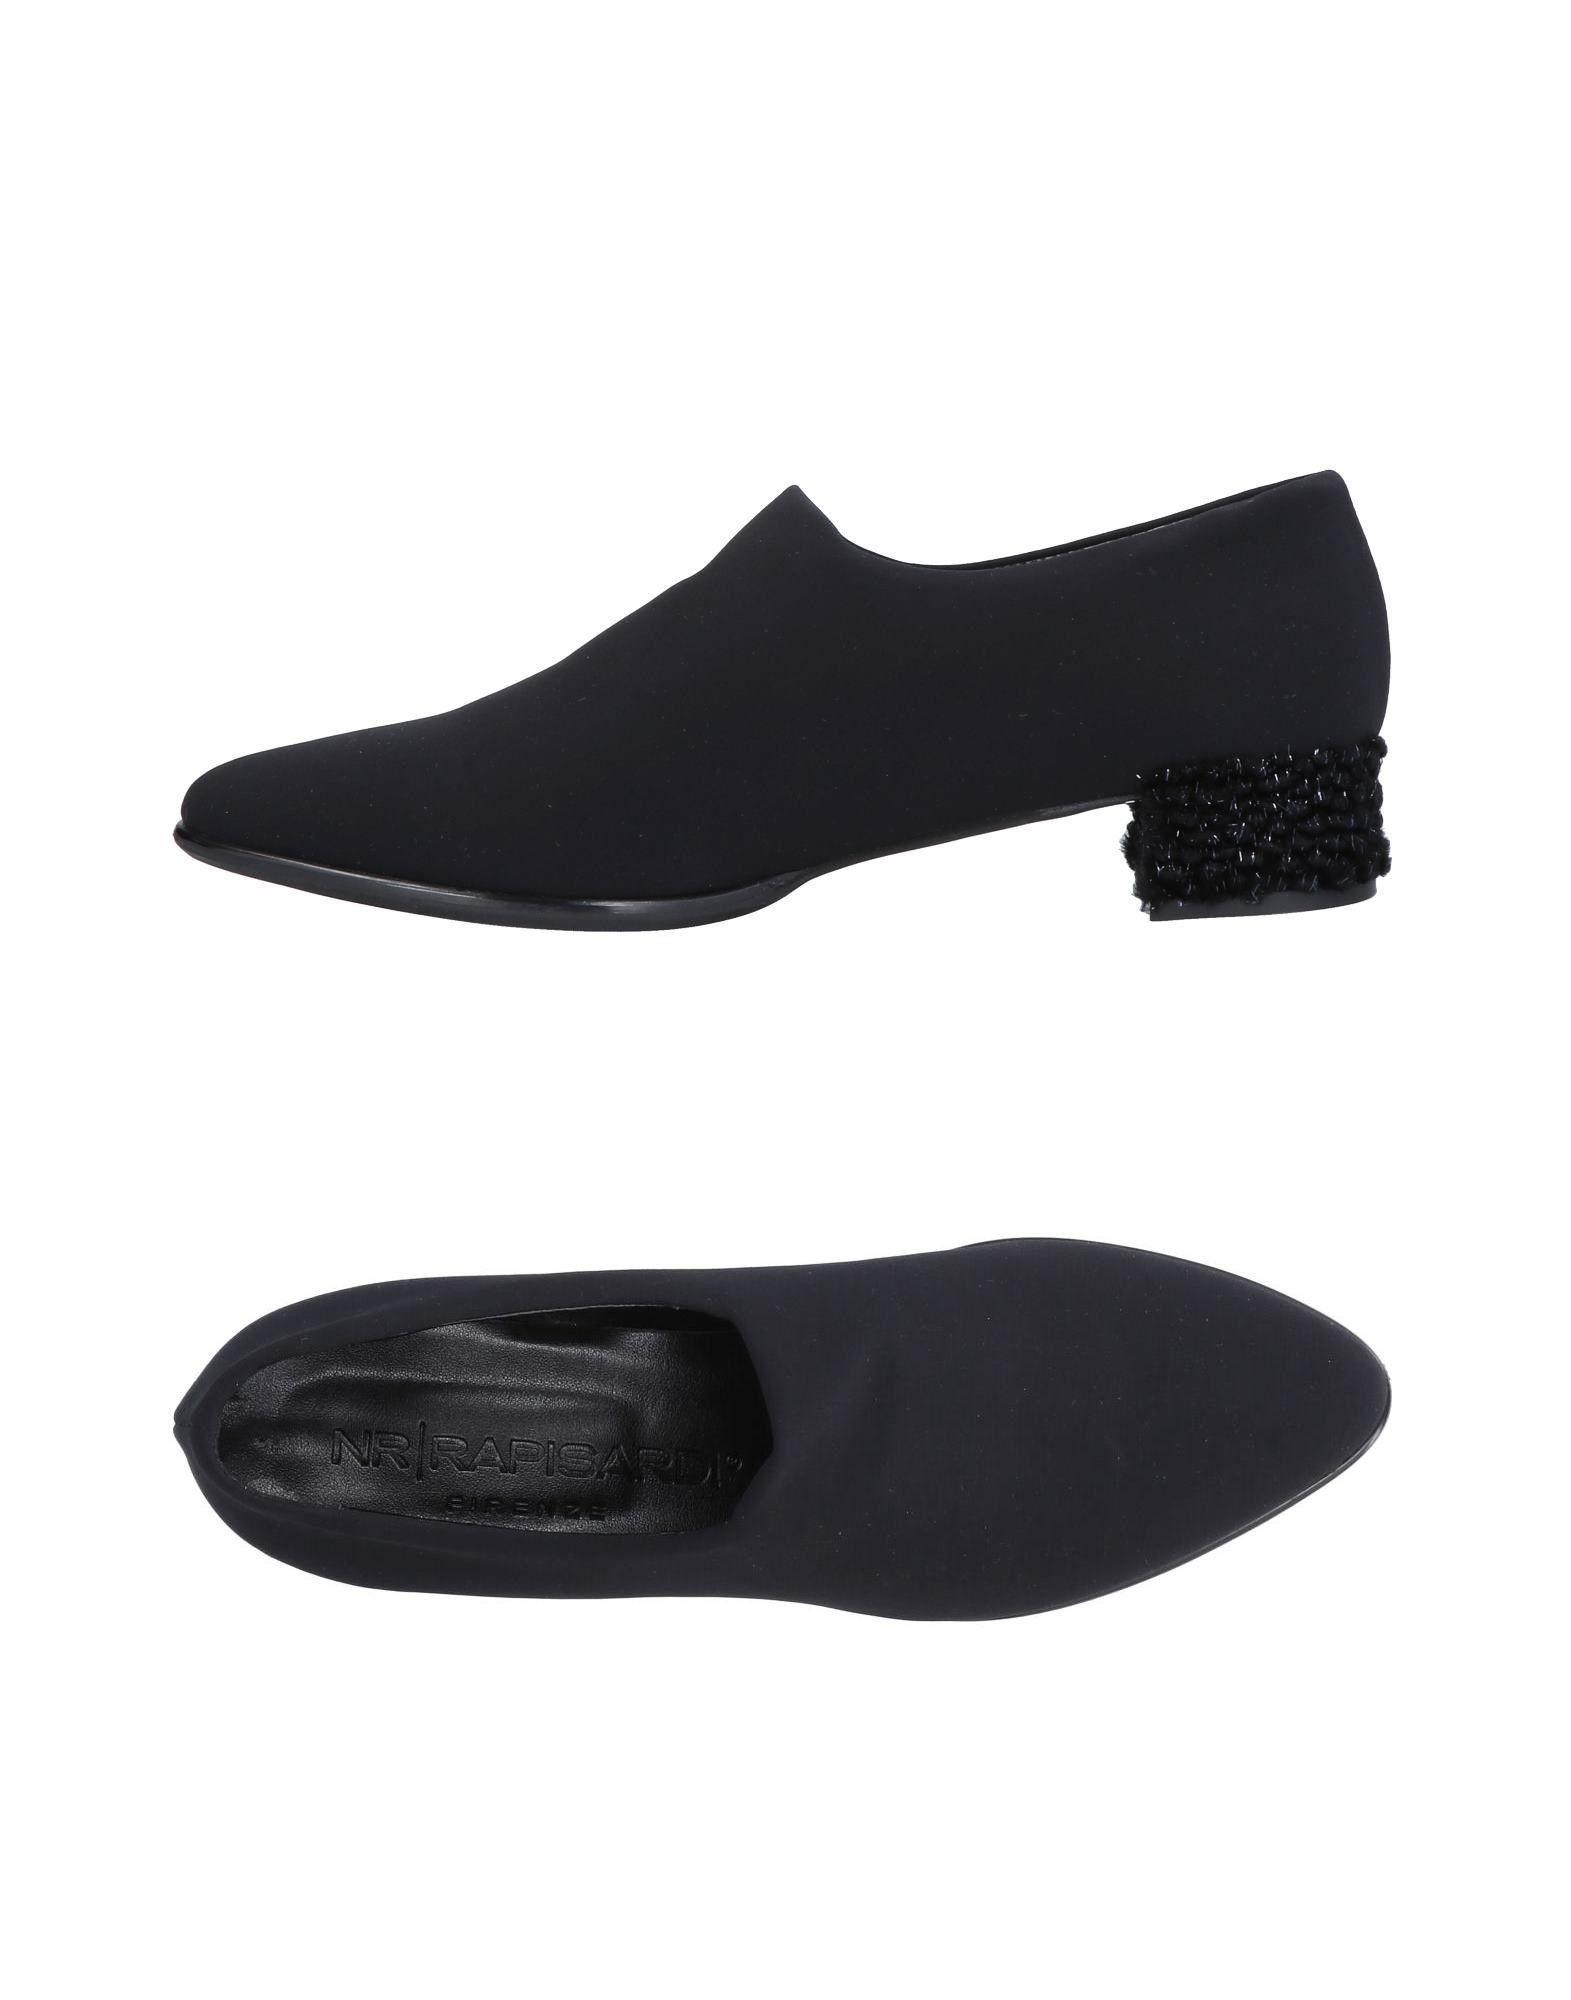 Nr Rapisardi Pumps Damen  11504909QG Gute Qualität beliebte Schuhe